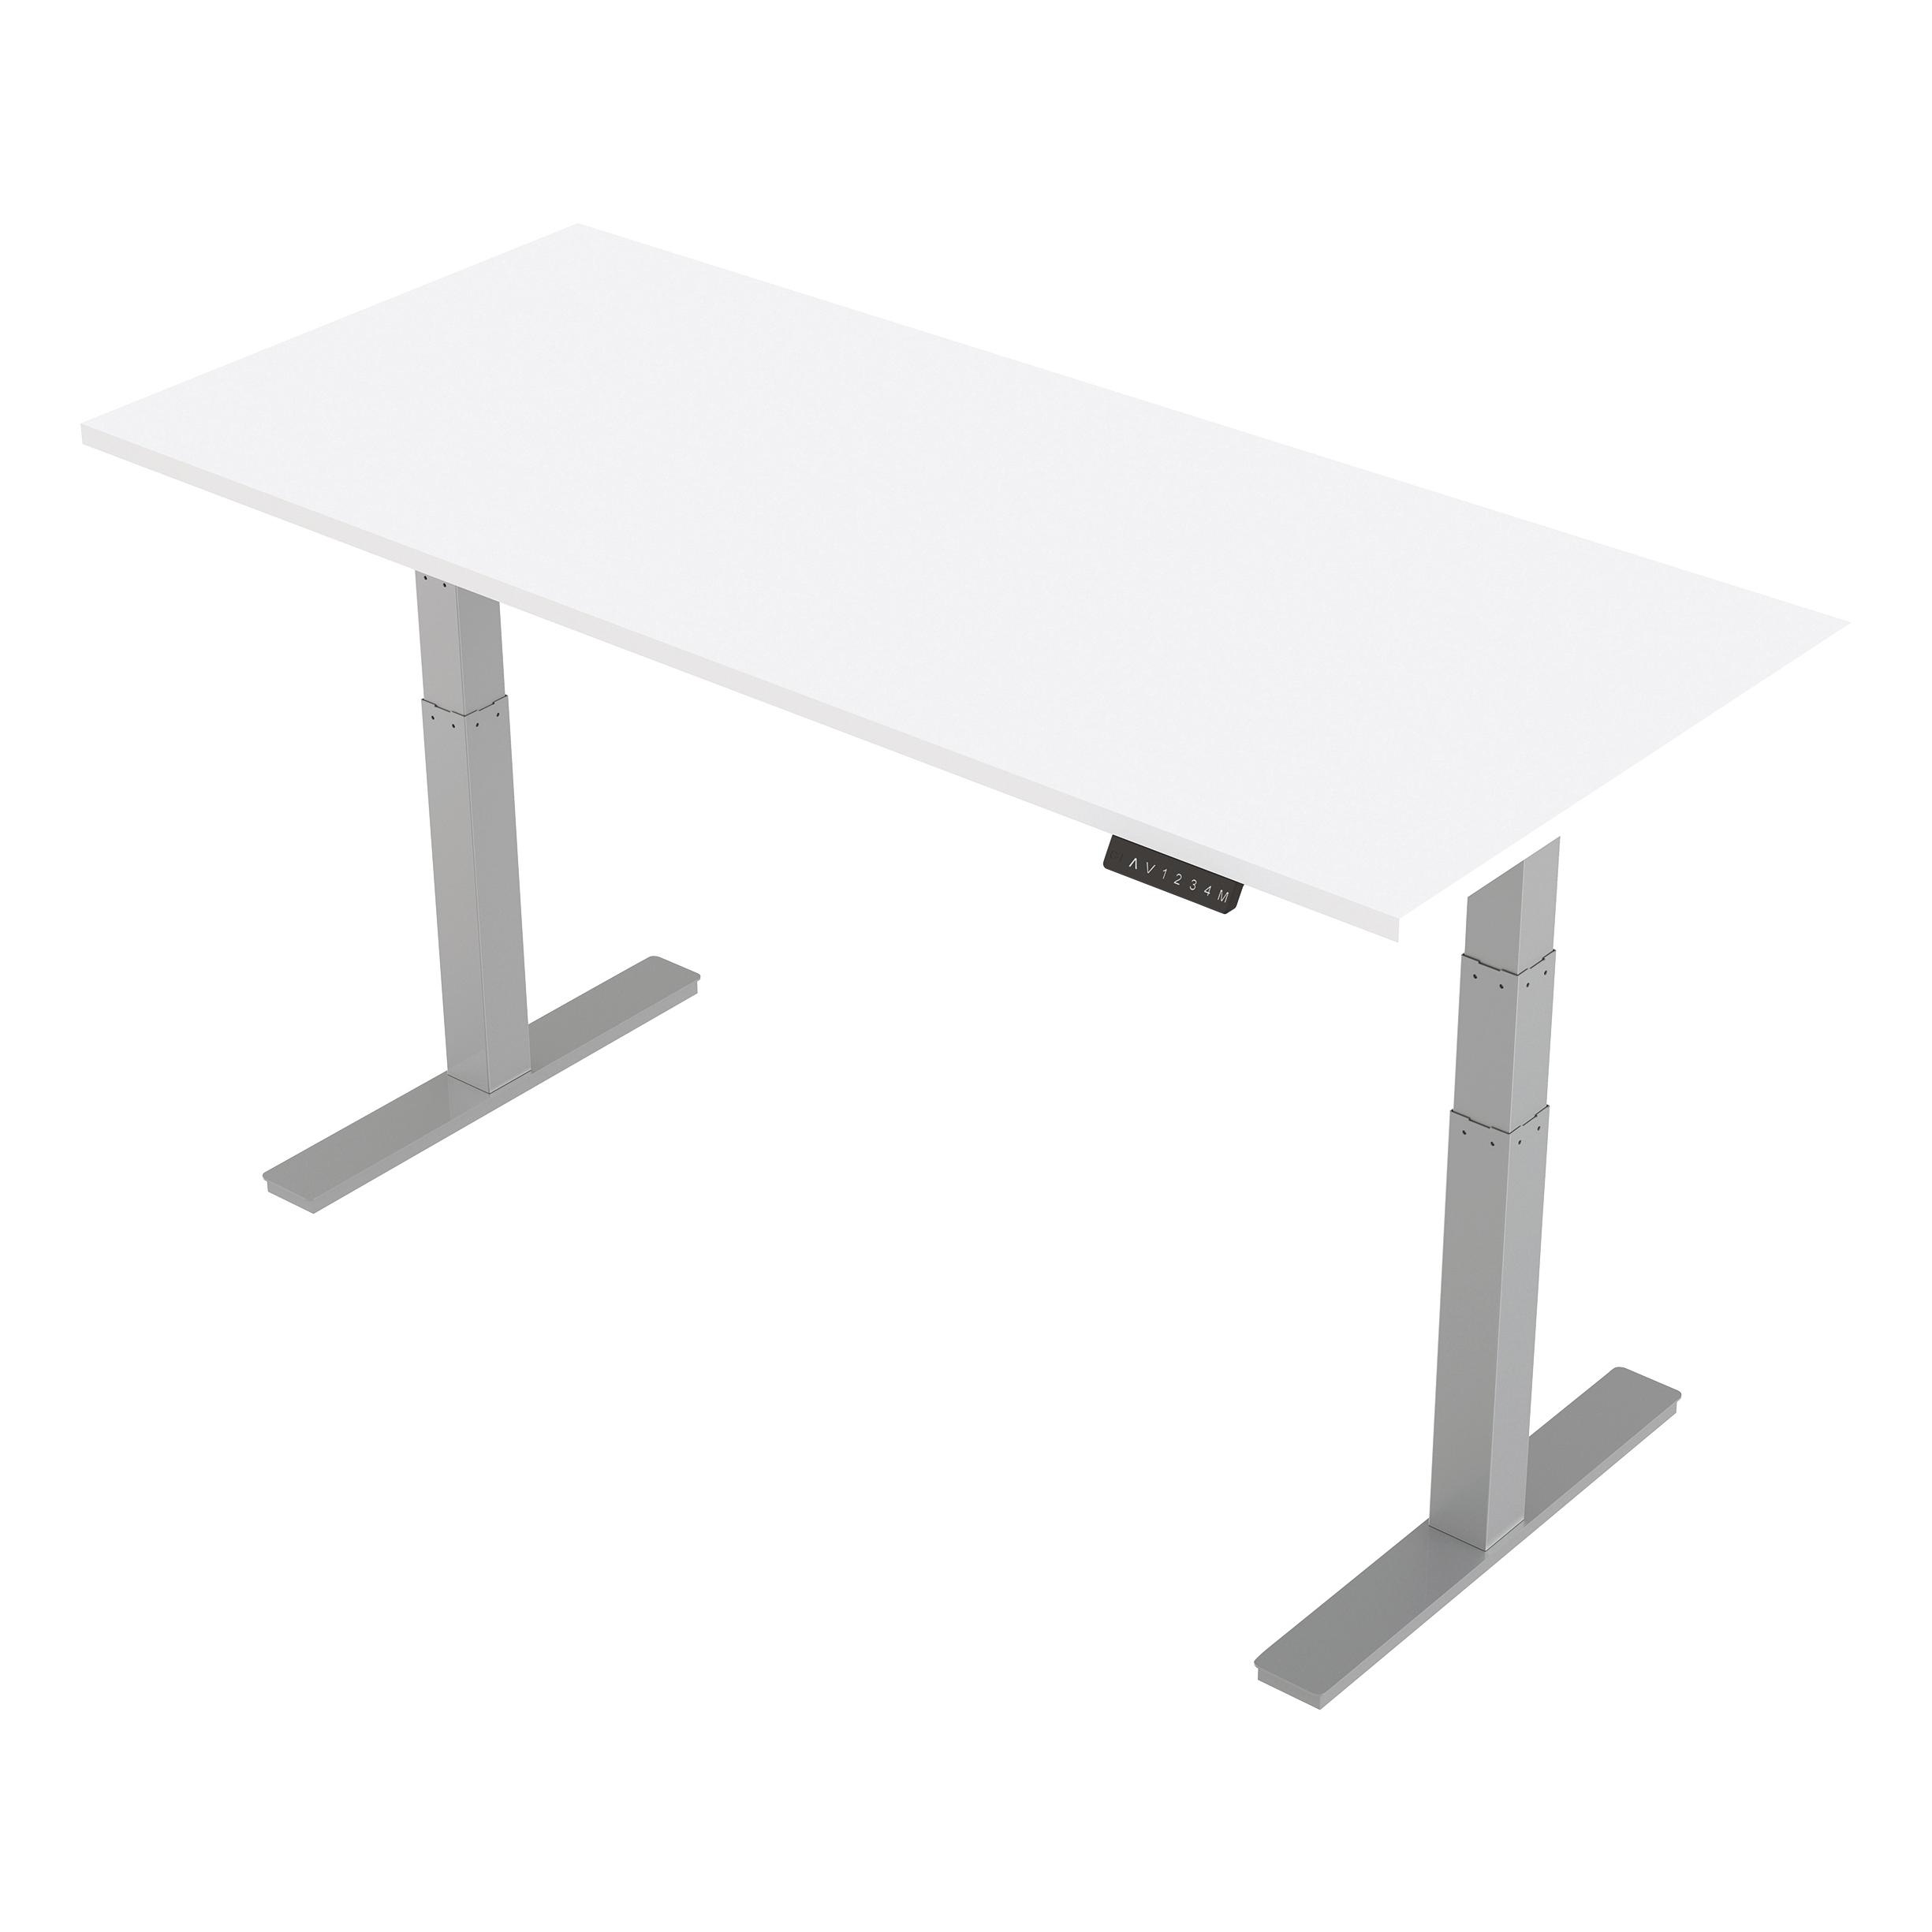 Trexus Sit-Stand Desk Height-adjustable Silver Leg Frame 1800/800mm White Ref HA01012